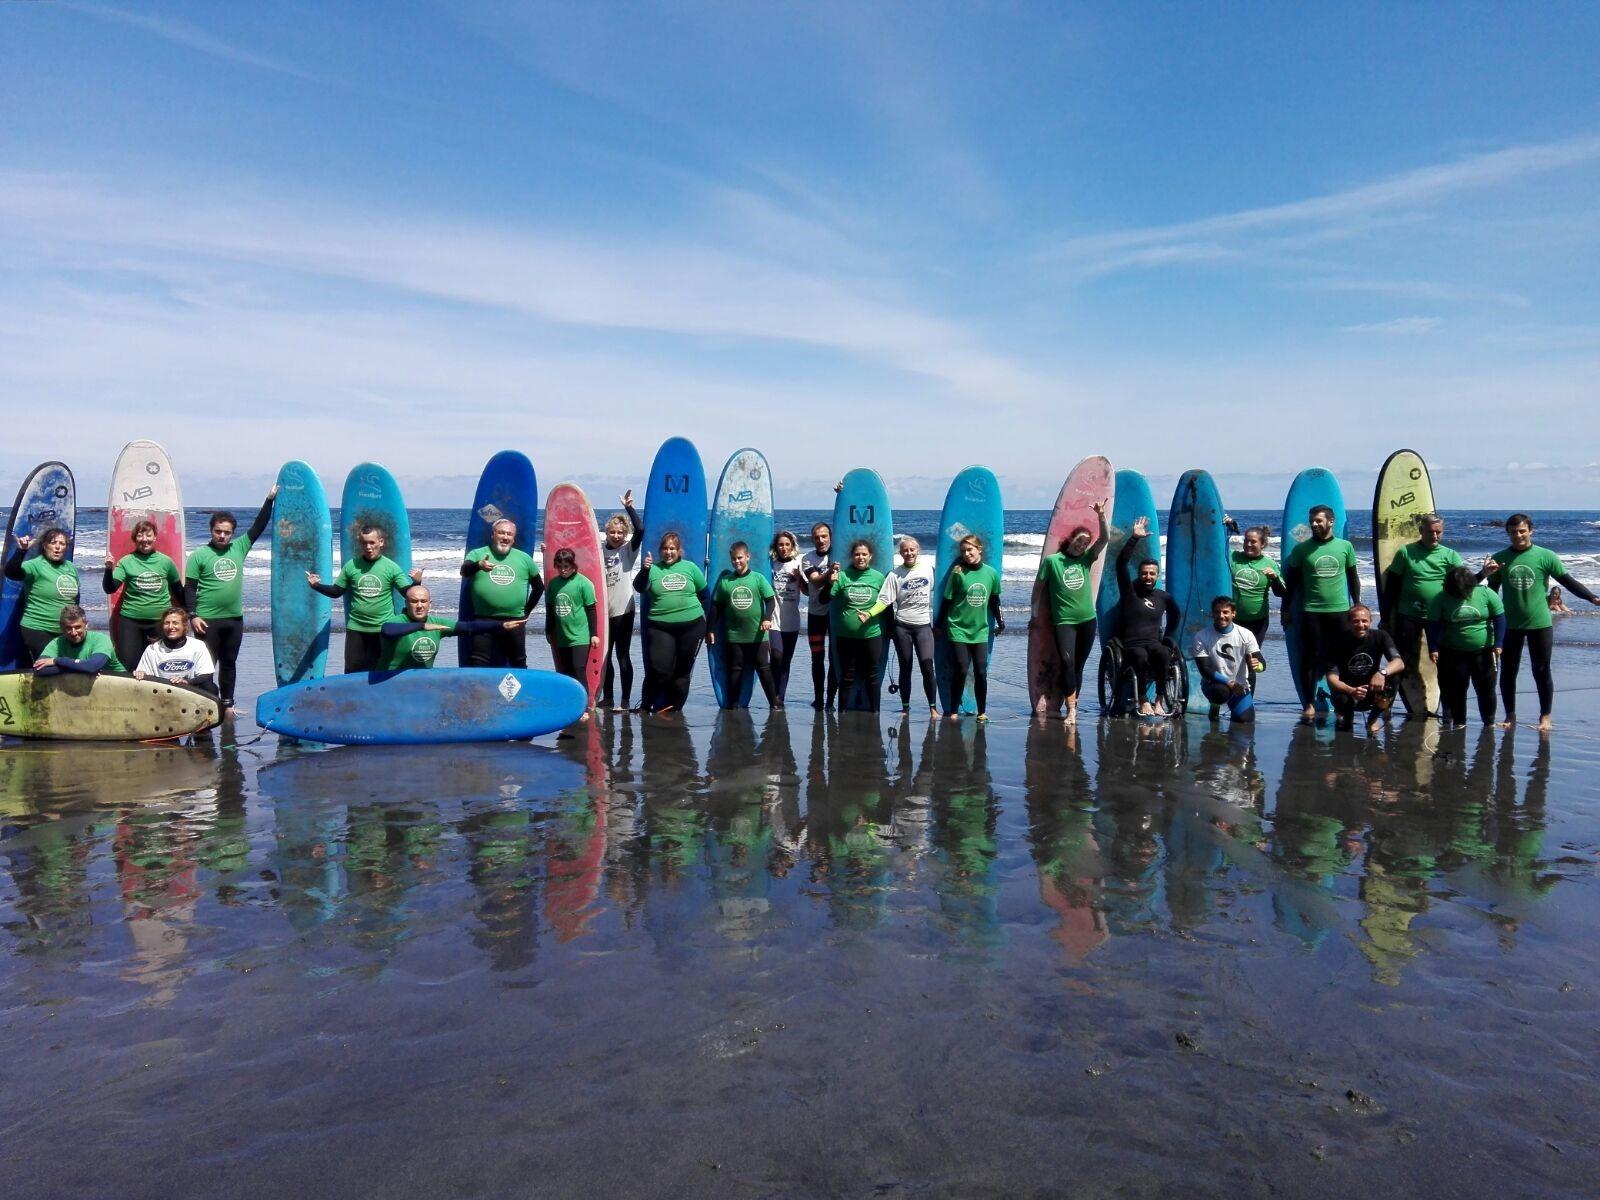 Clases de surf para discapacitados